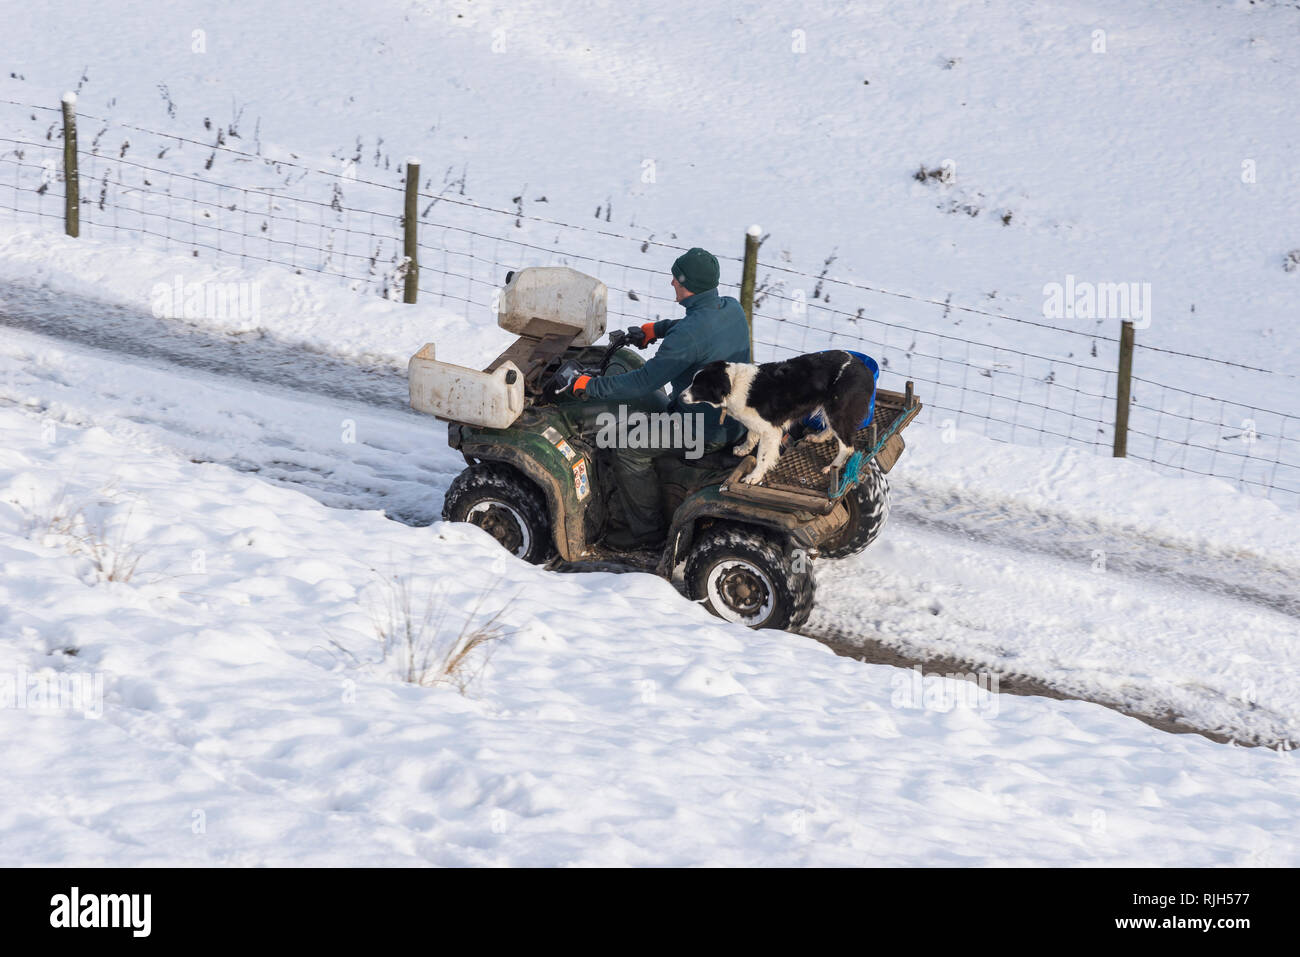 Farmer on a quad bike with his Border Collie dog on a snowy